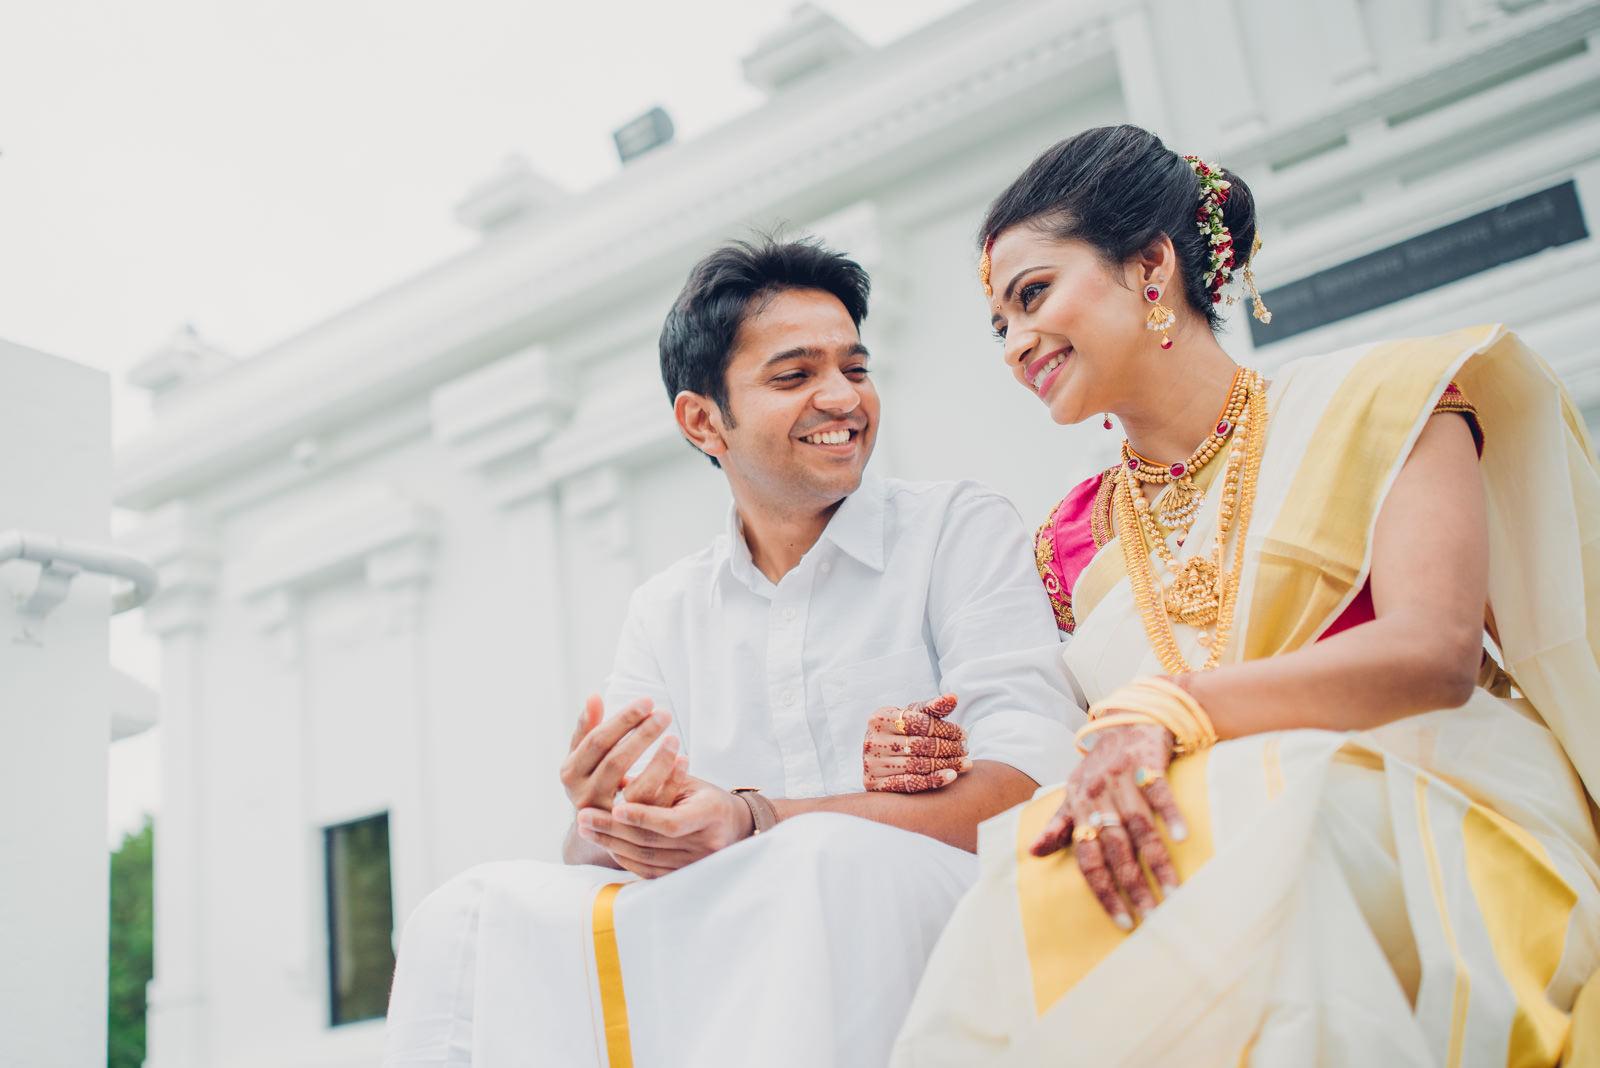 Parvaty + Sahil   Malayalee Wedding in Maryland, USA — One